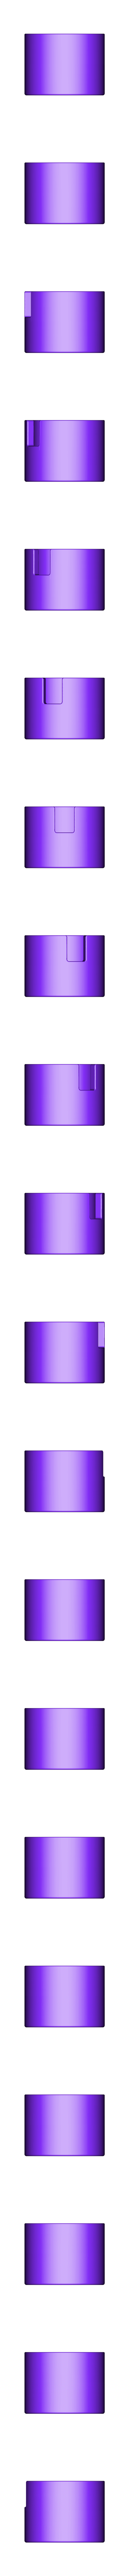 Socle_portefiltre.stl Download free STL file Lelit filterholder mount • 3D printing object, touchthebitum